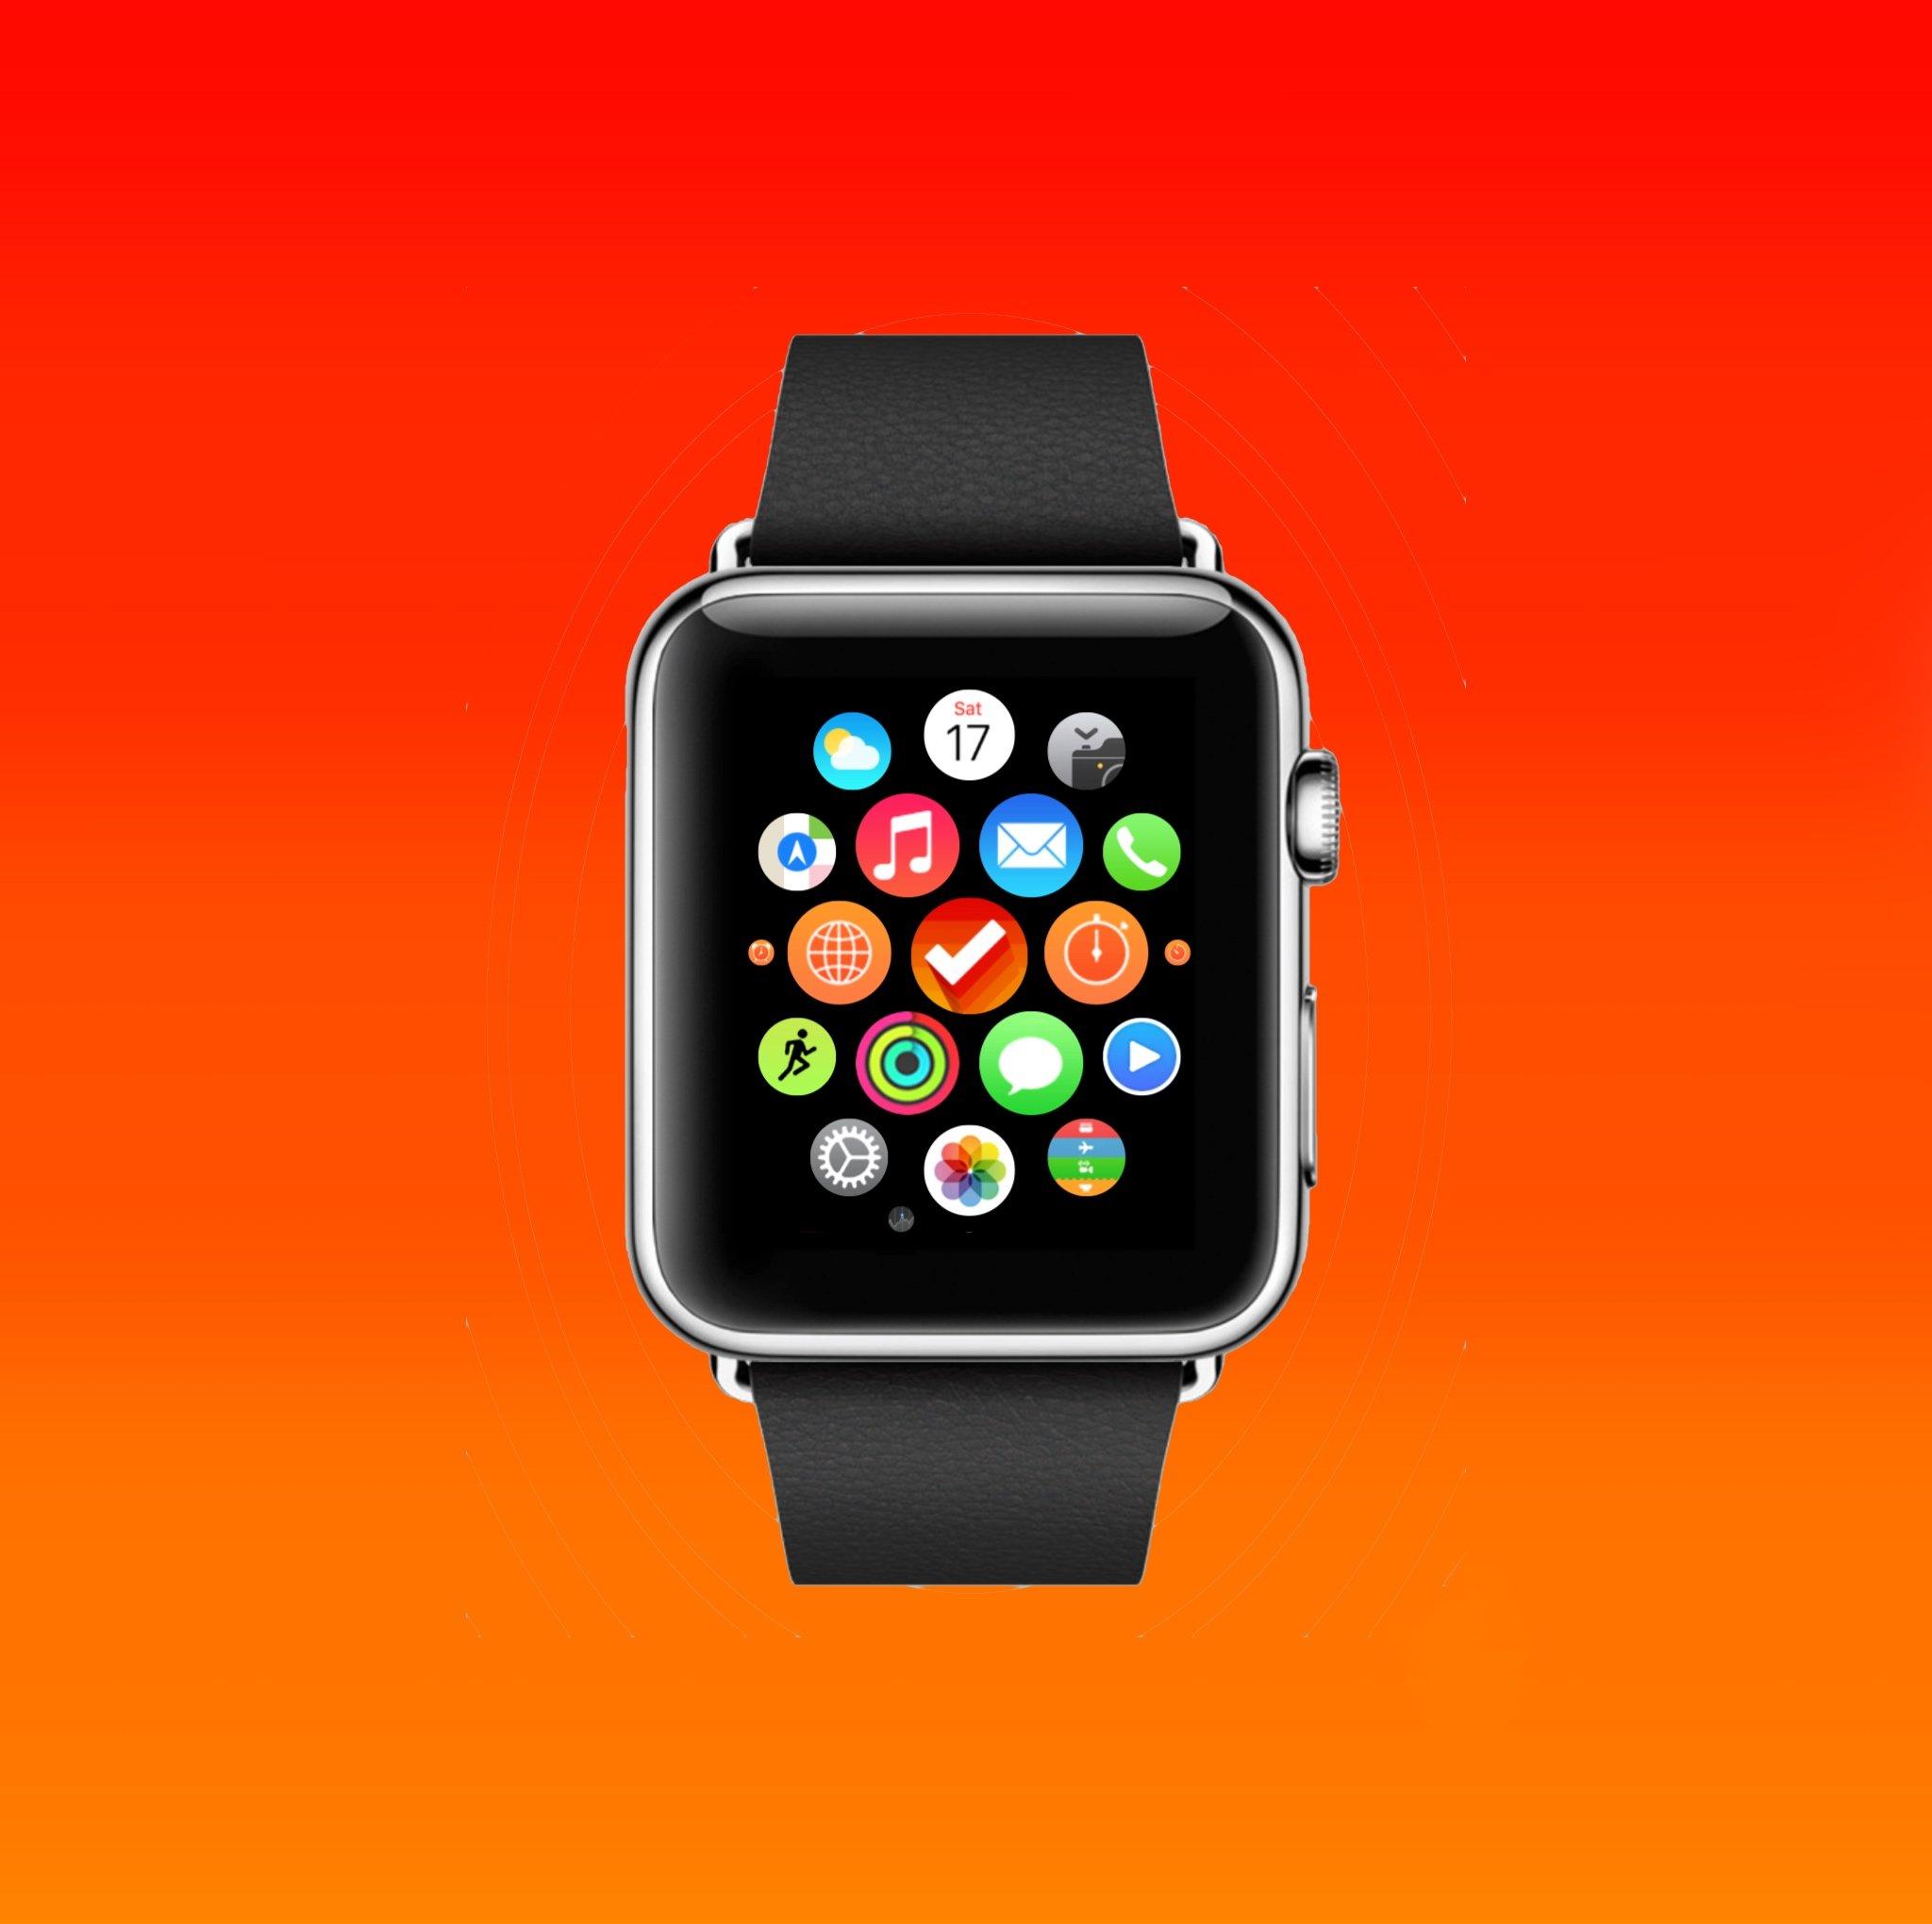 WatchAware: 10 useful Apple Watch tips